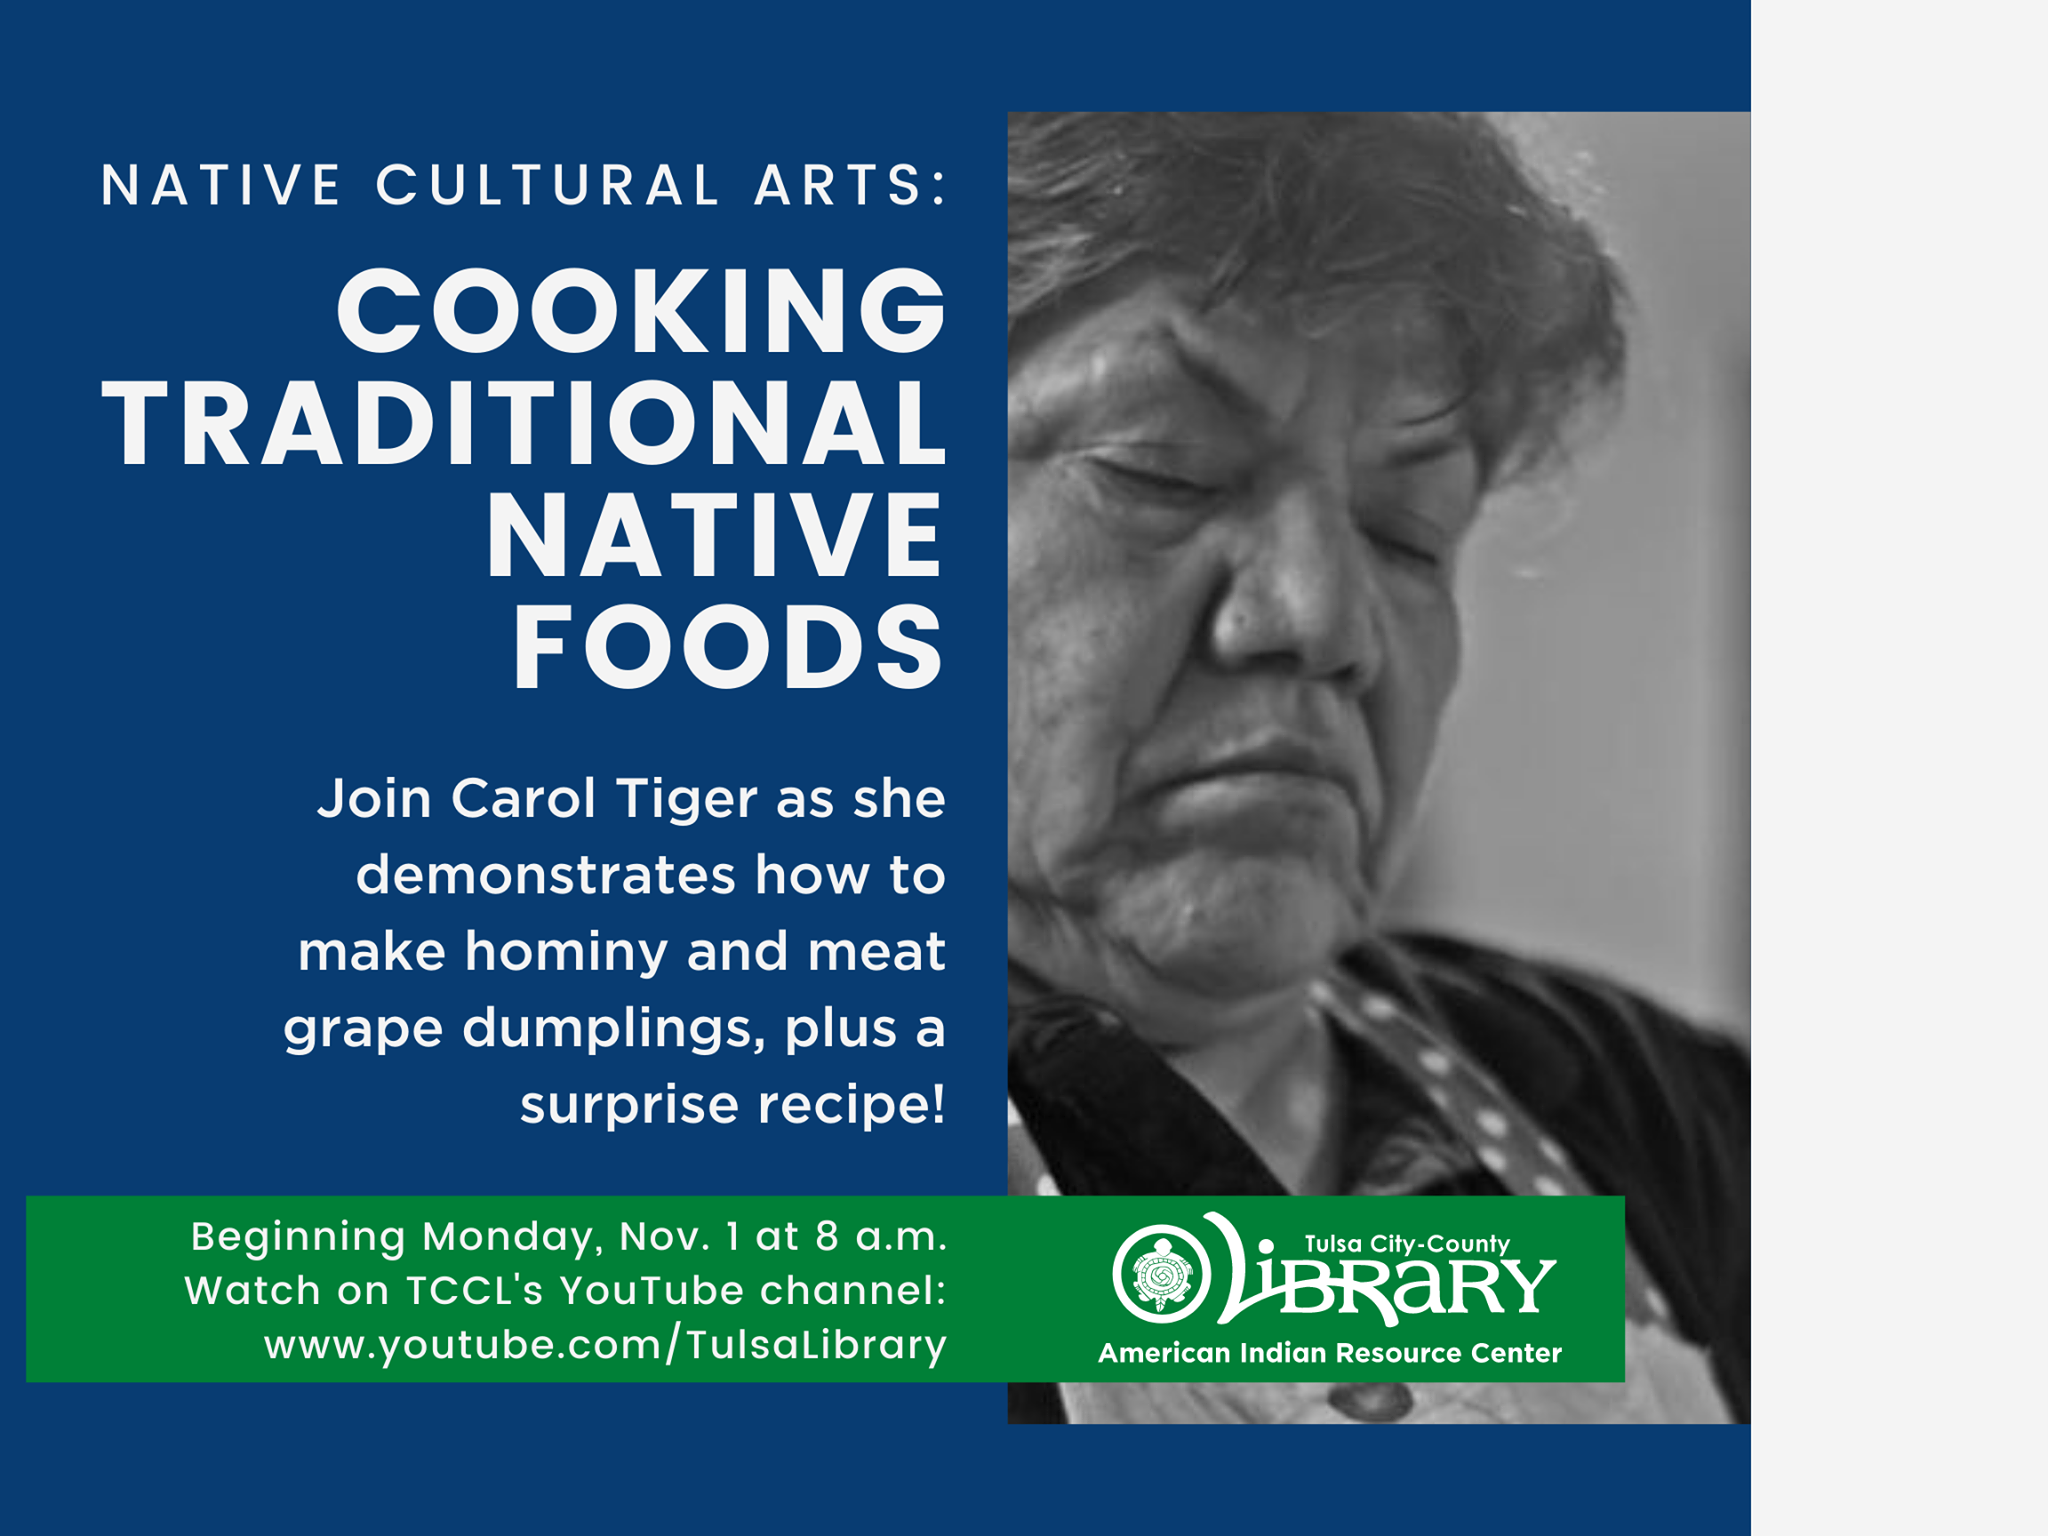 Cook Native